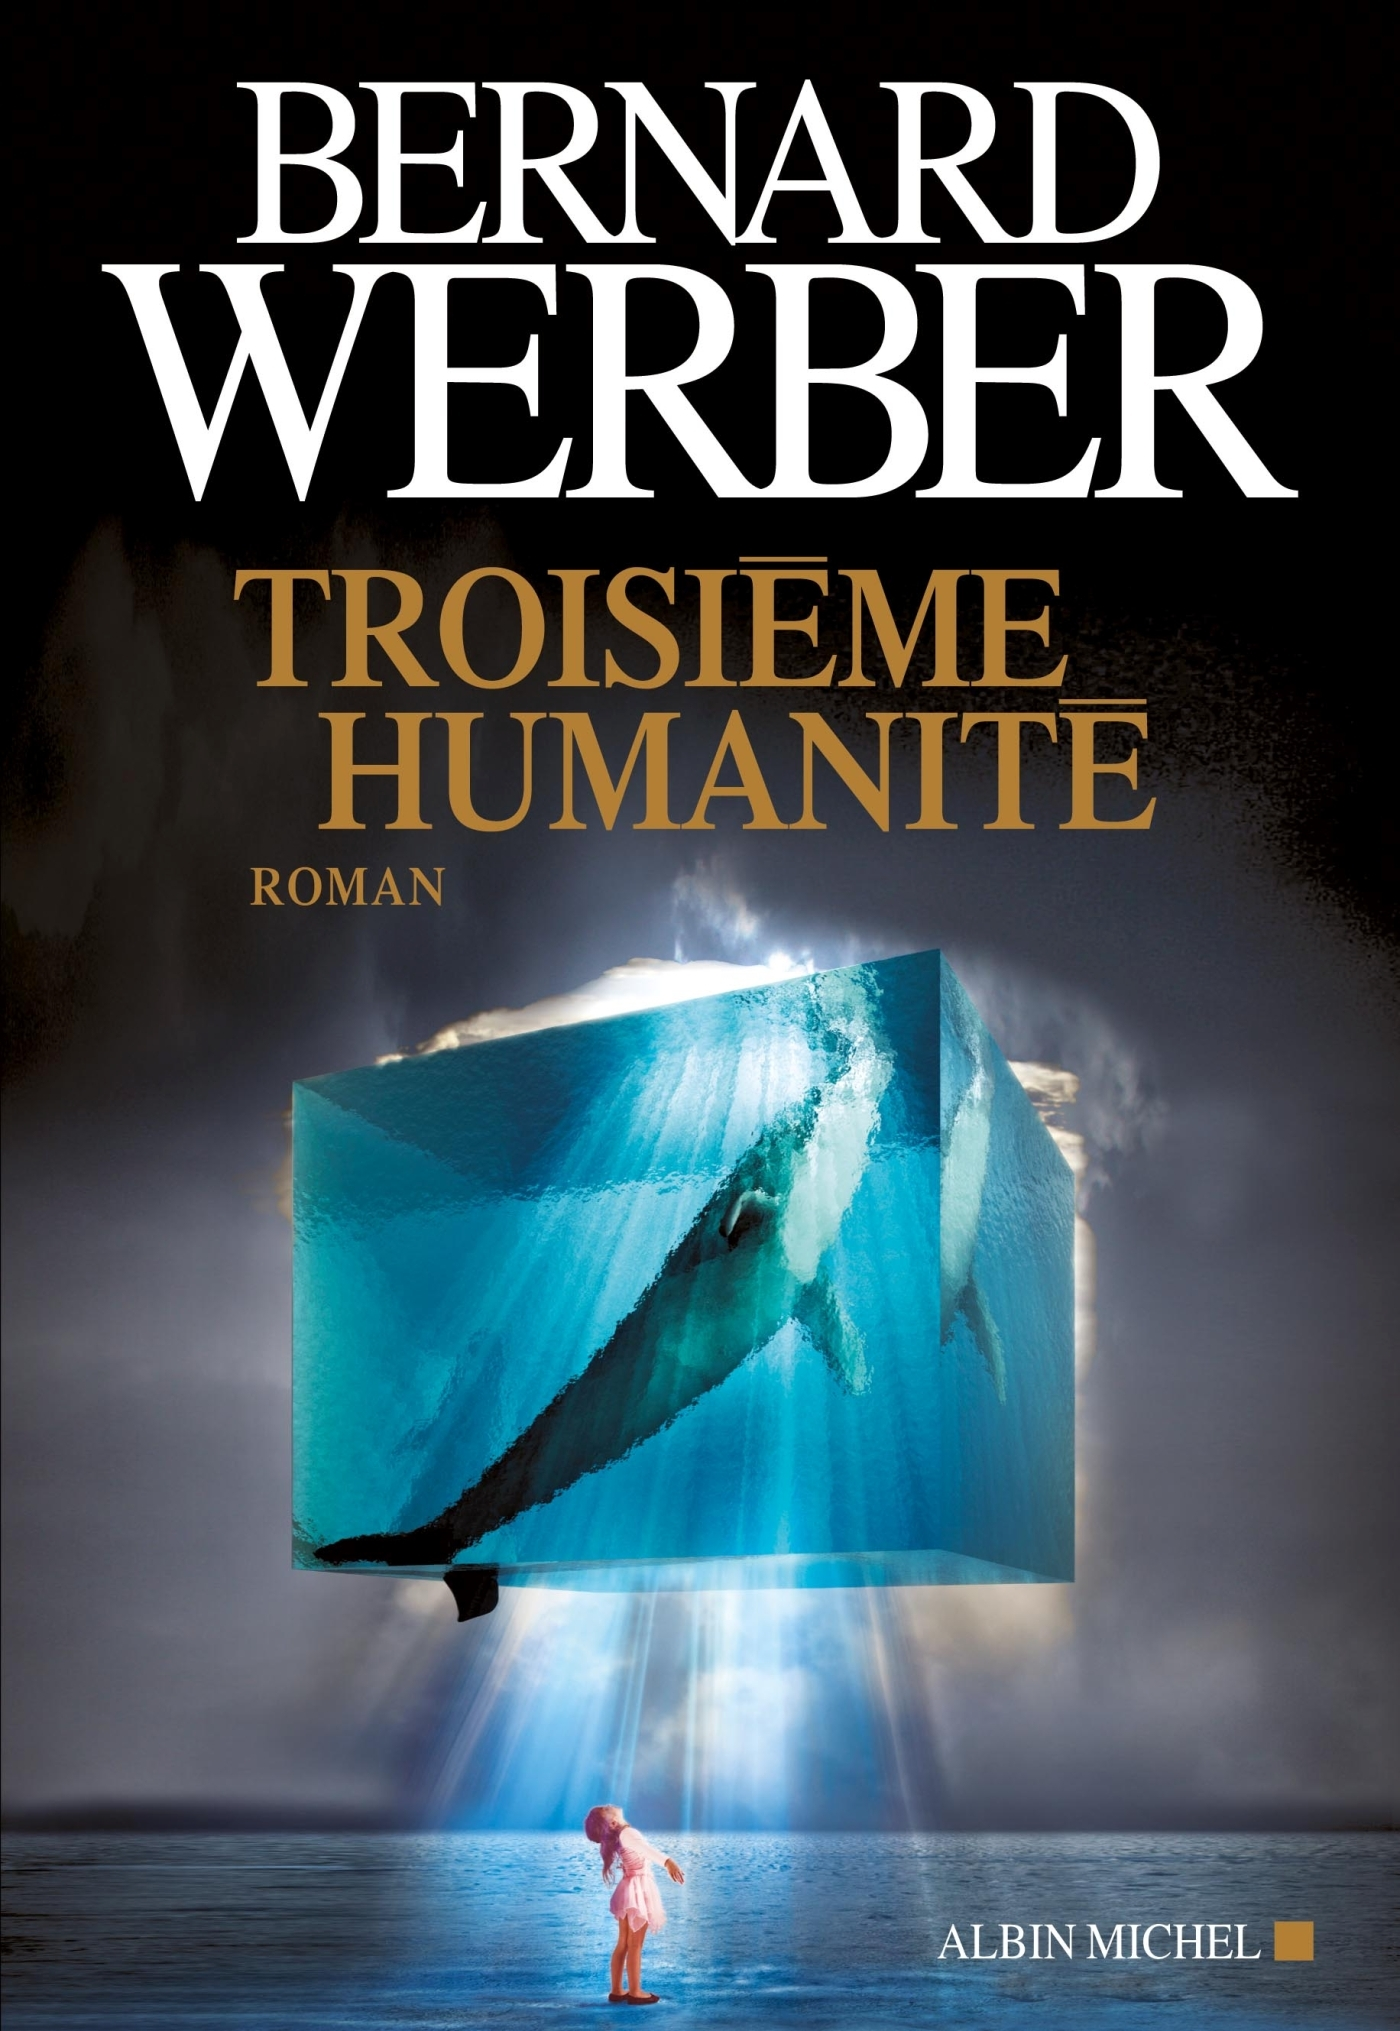 TROISIEME HUMANITE